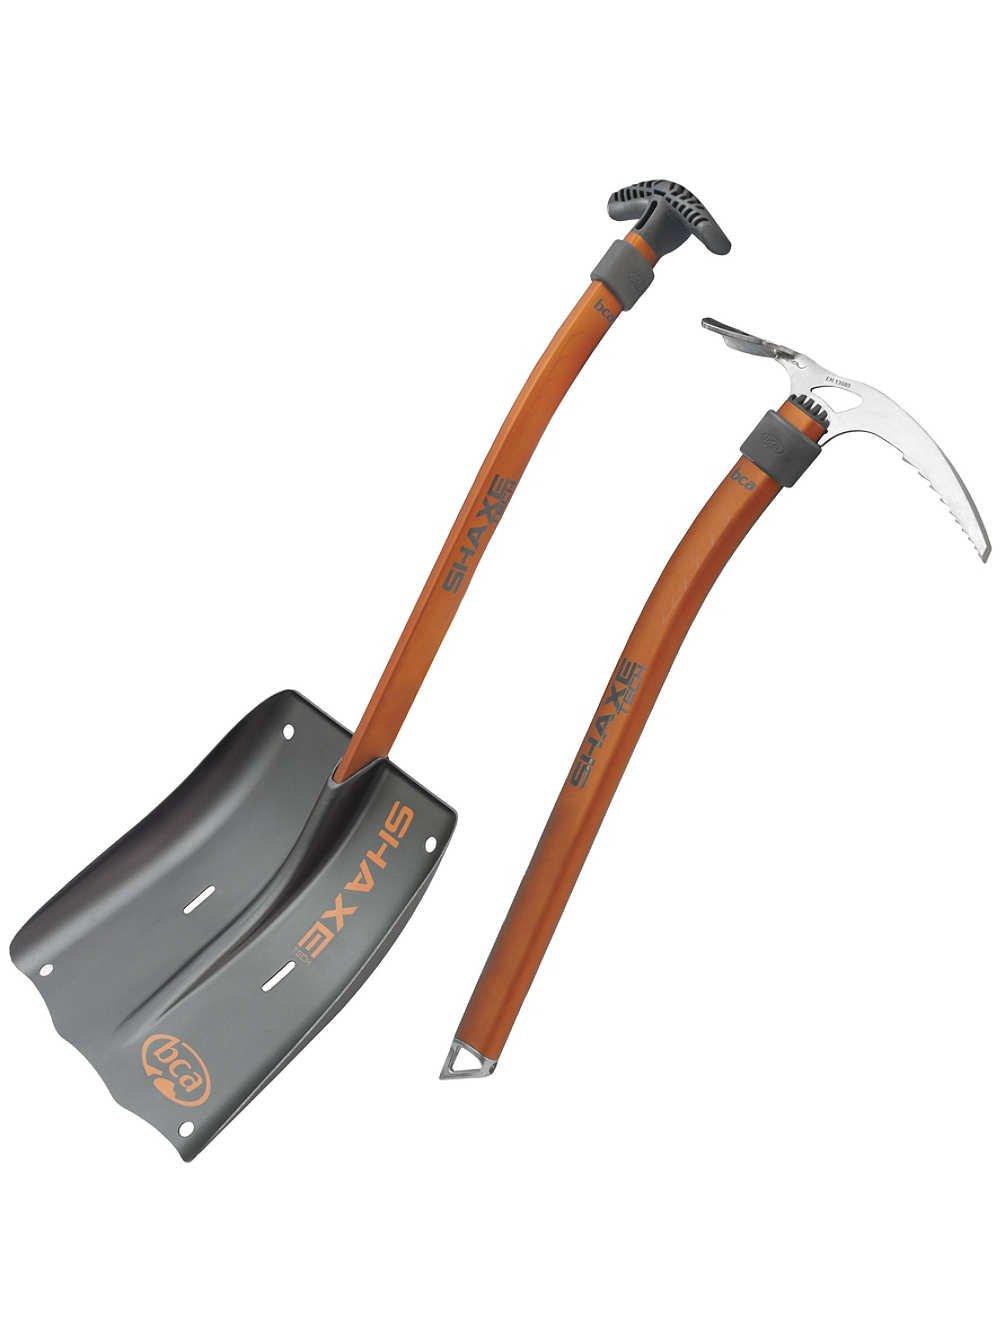 Backcountry Access Shaxe Tech Shovel One Size by Backcountry Access